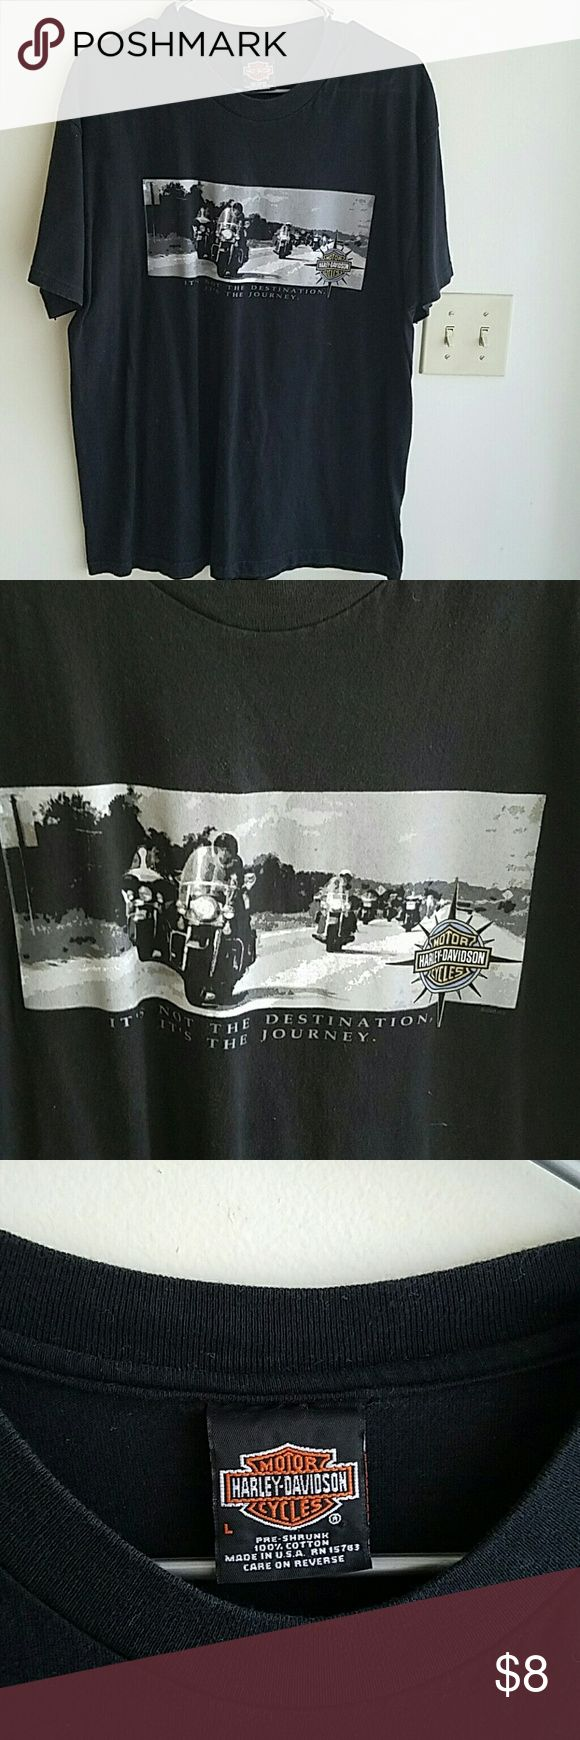 HD tee, Sz Lg, San Diego, CA Good condition, 10+yrs, havent worn Harley-Davidson Shirts Tees - Short Sleeve